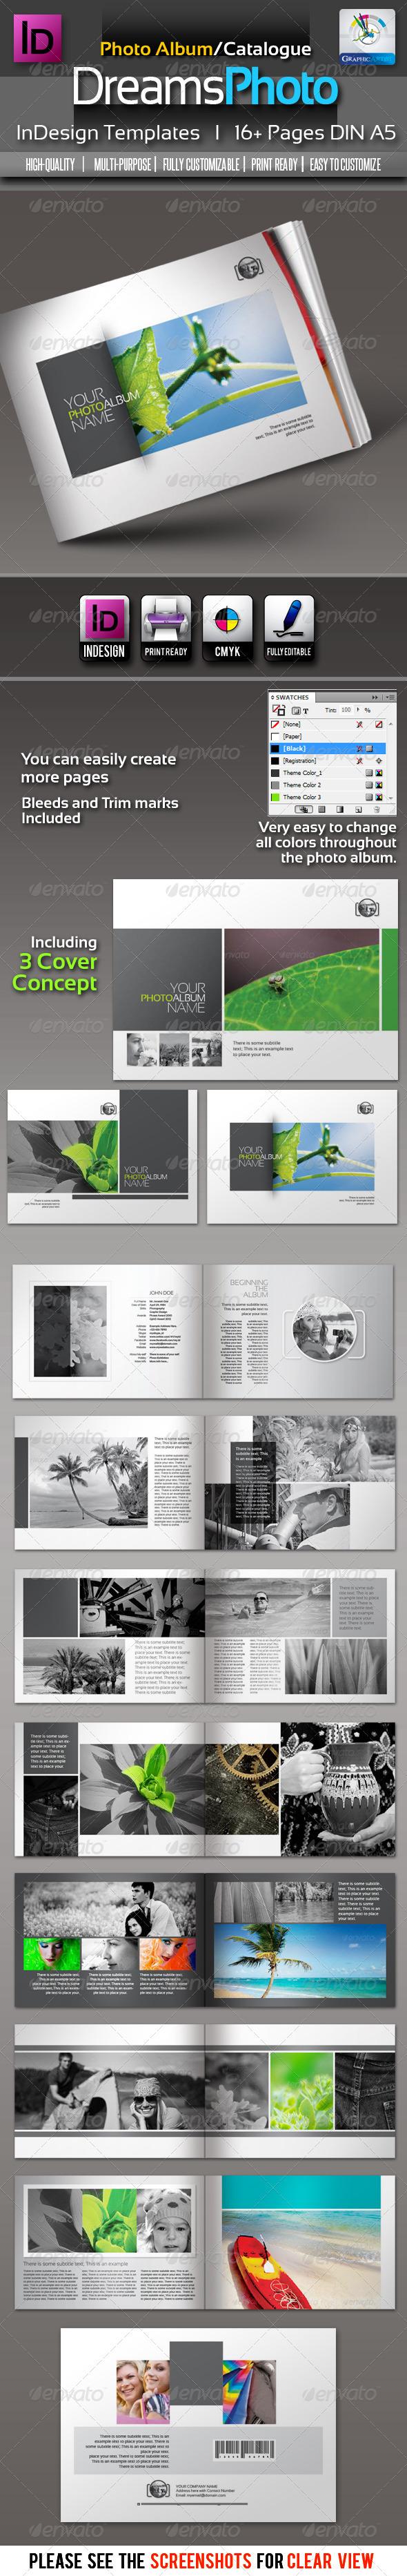 GraphicRiver Dreams Clean Photo Album InDesign Templates 2622174